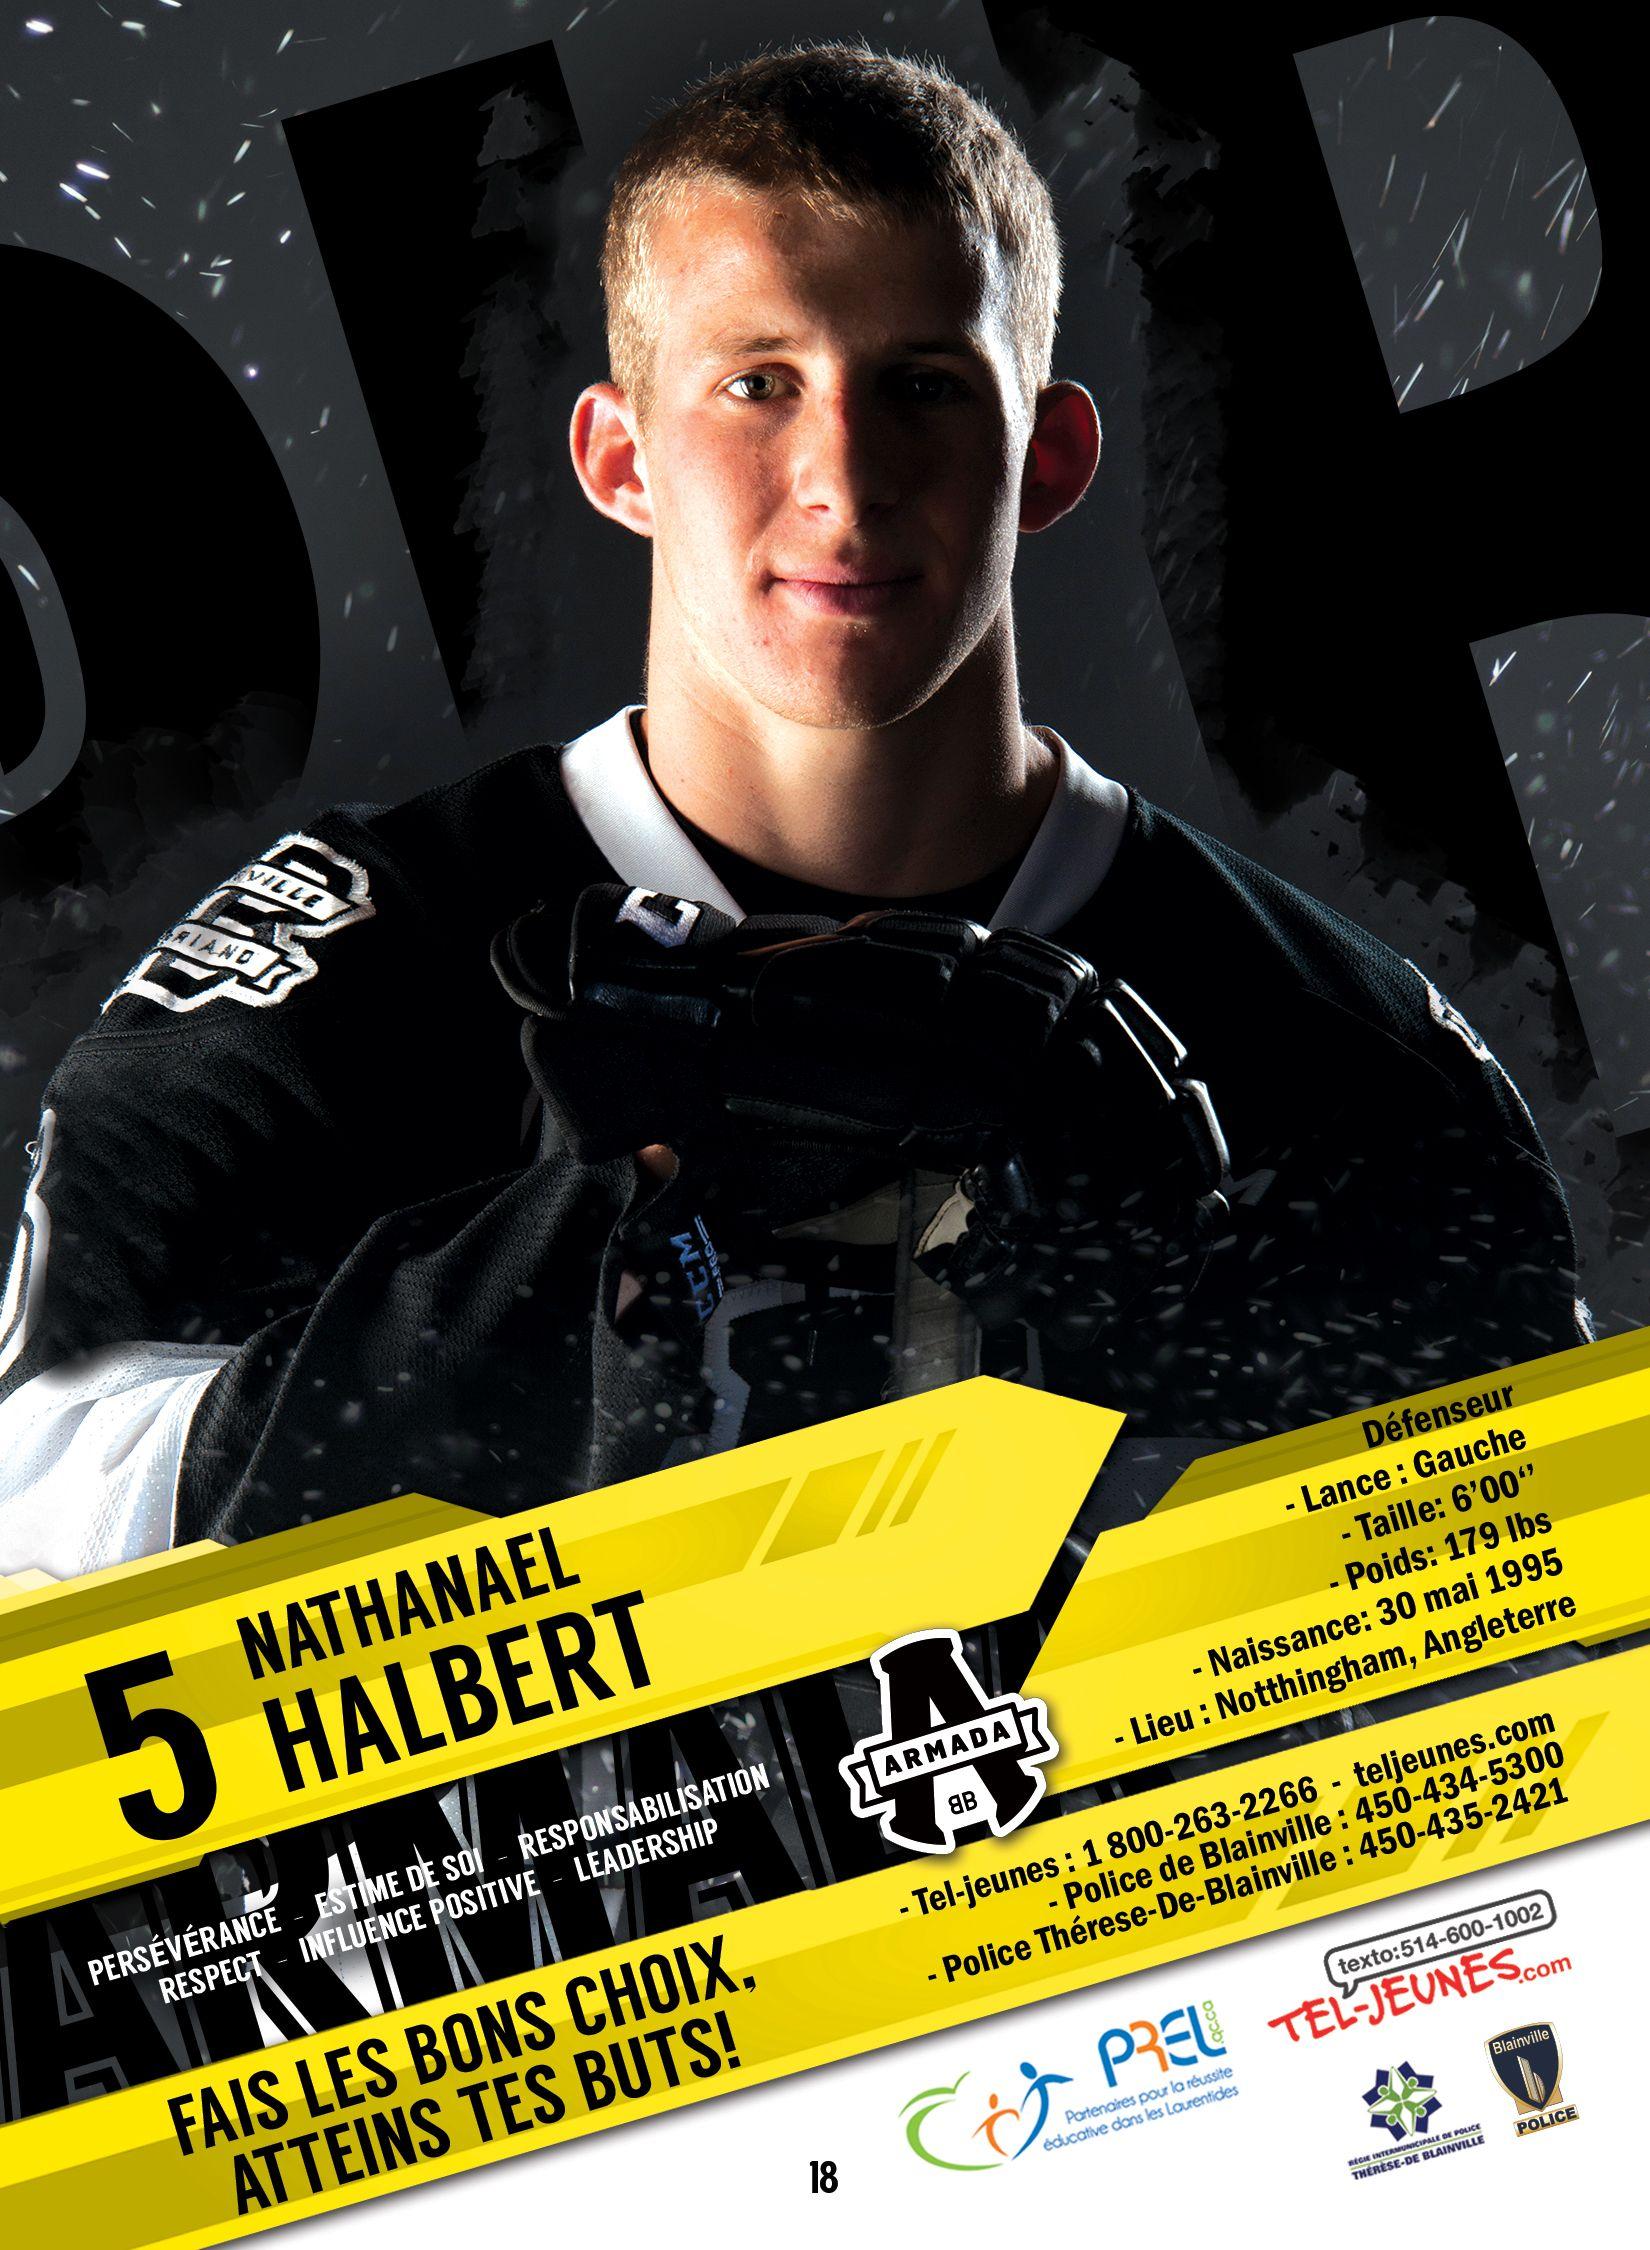 Nathanael Halbert #5